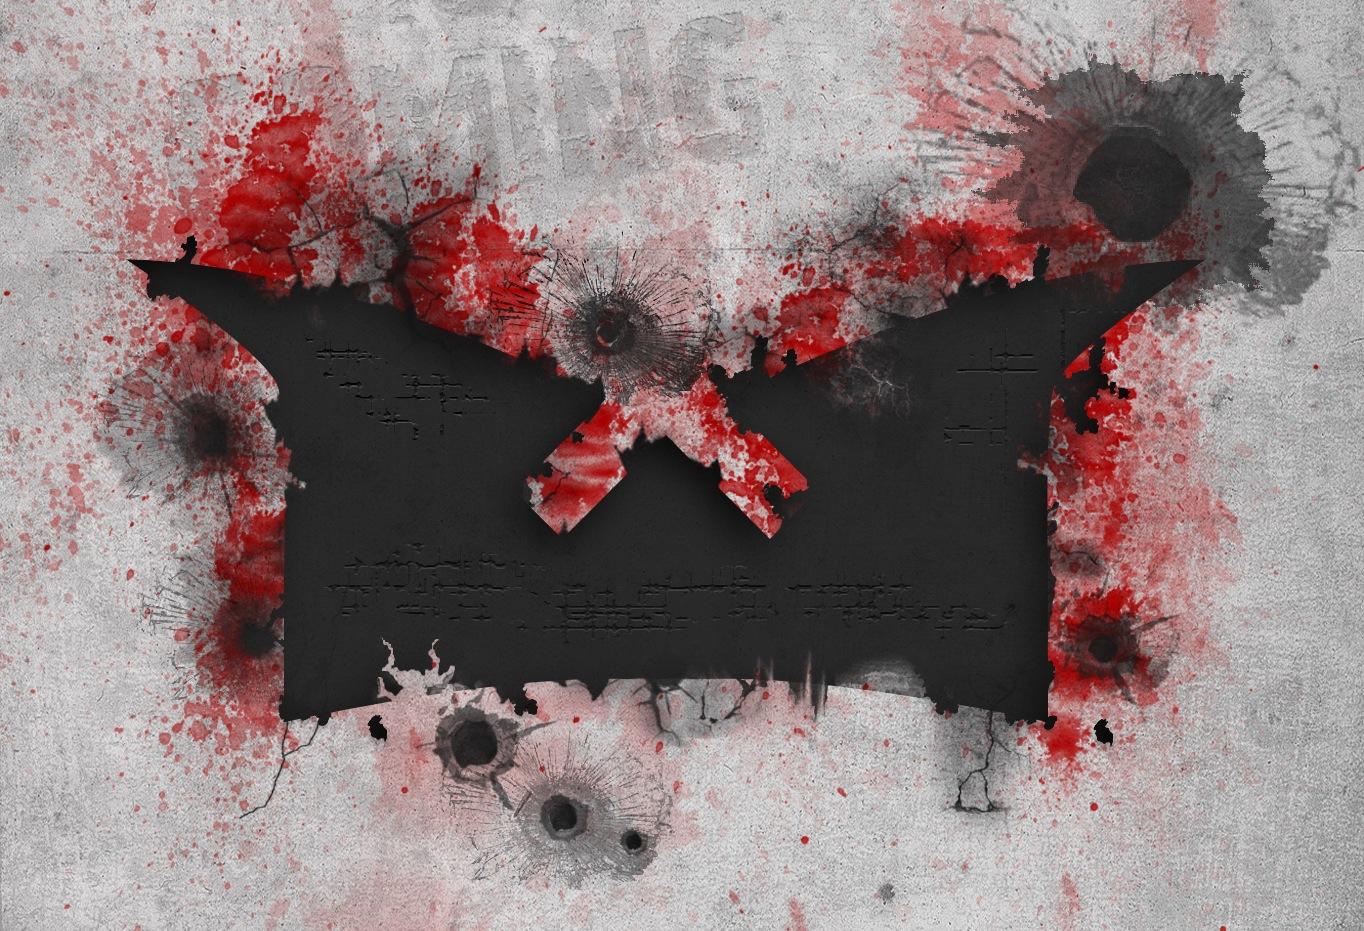 horror an essay on abjection Powers of horror an essay on abjection julia kristeva translated by leon s roudiez columbia university press new york 1982.